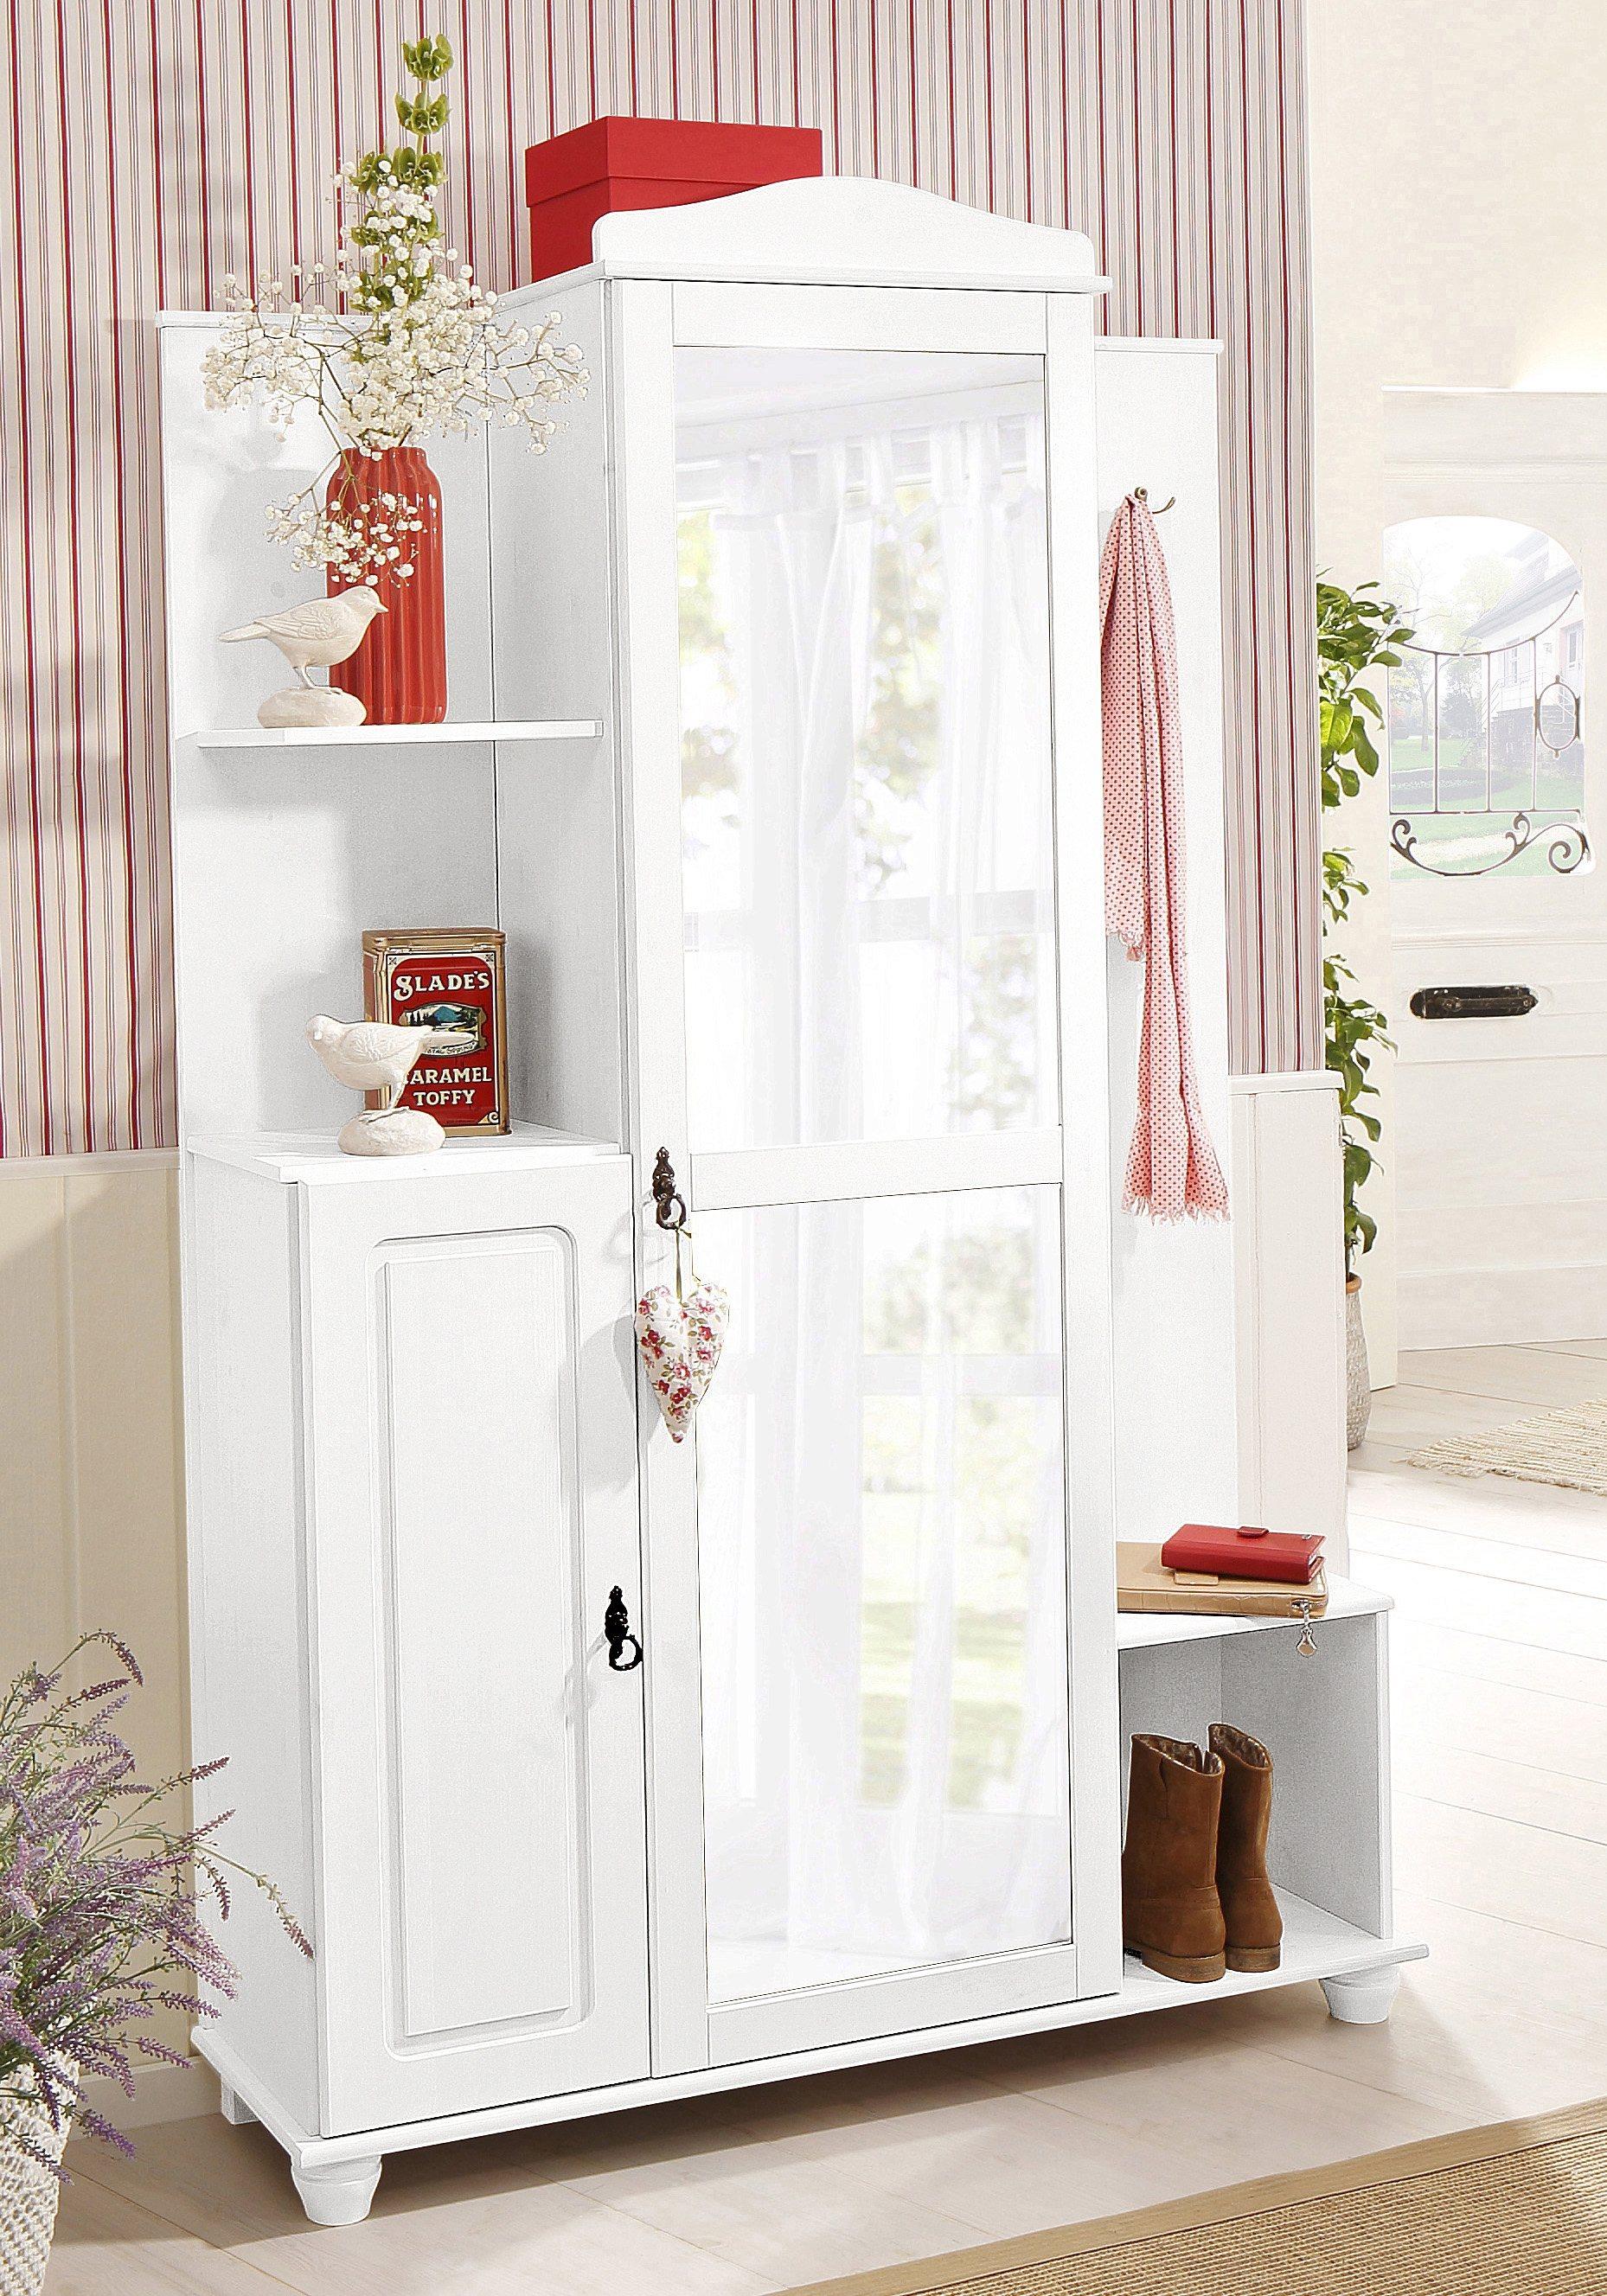 Kompaktgarderobe, Home affaire, »Finca« | Flur & Diele > Garderoben > Garderobenschränke | Weiß - Glanz | Lackiert - Holz - Massiver - Poliert | Home affaire